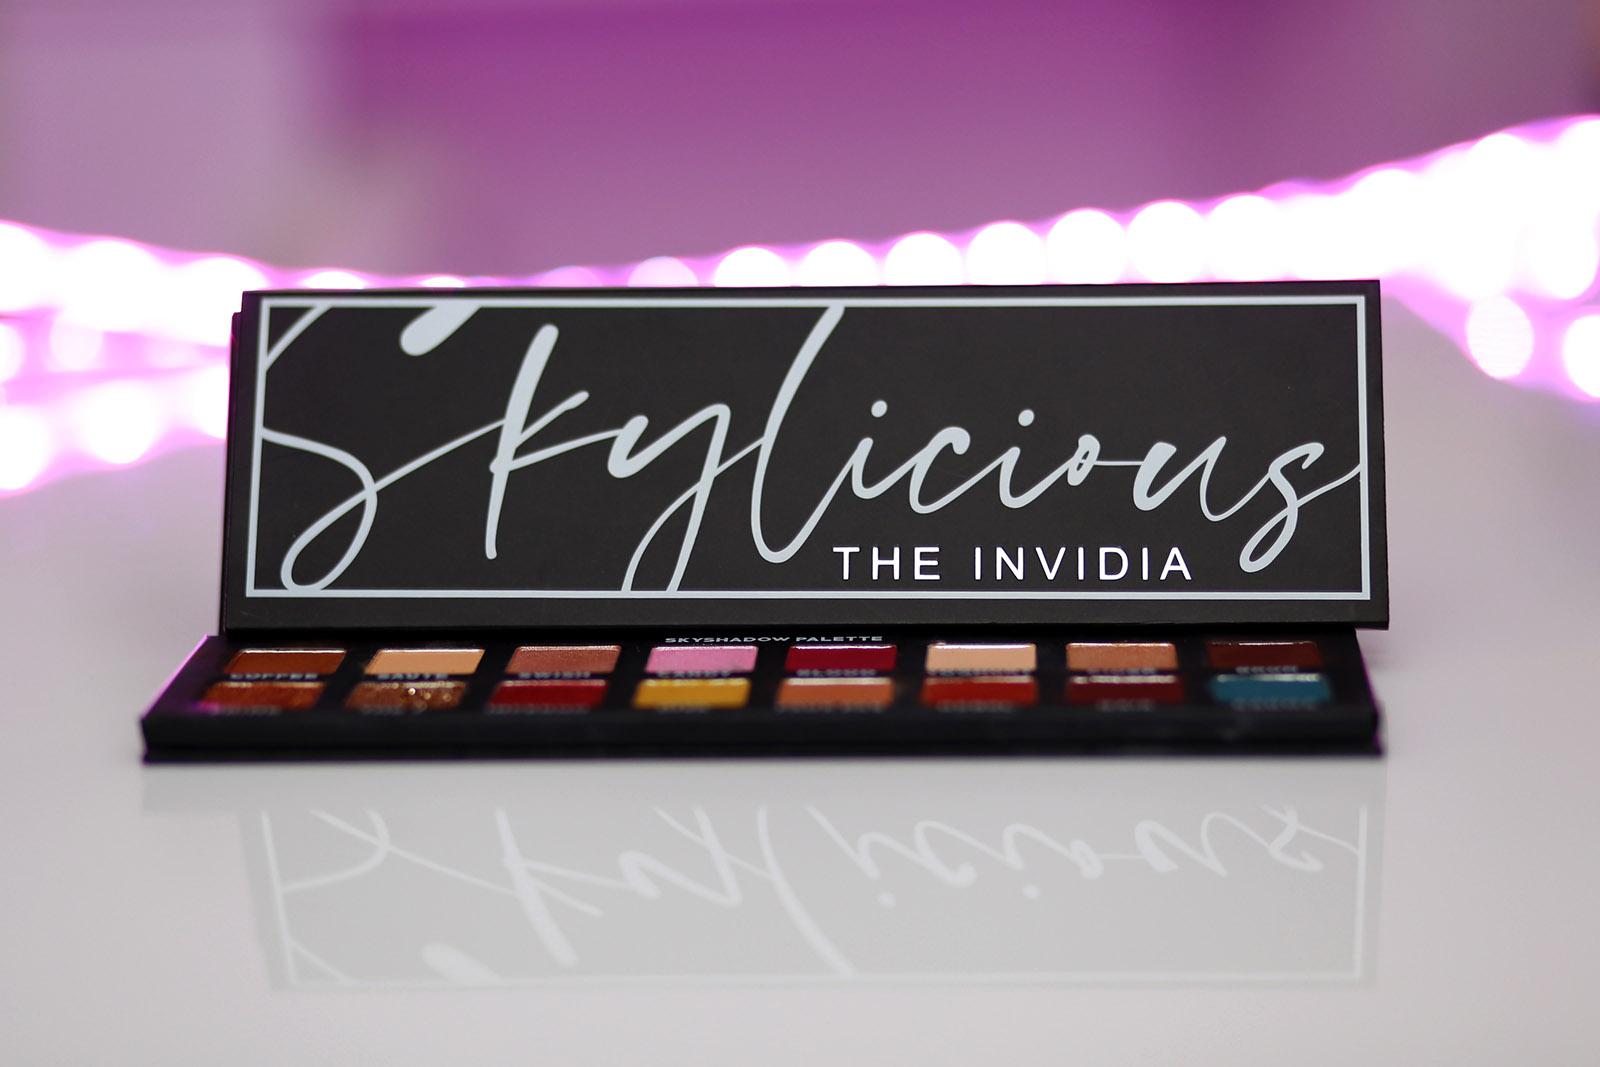 Skylicious The Invidia, paleta cieni do powiek w odcieniach brązu. Recenzja